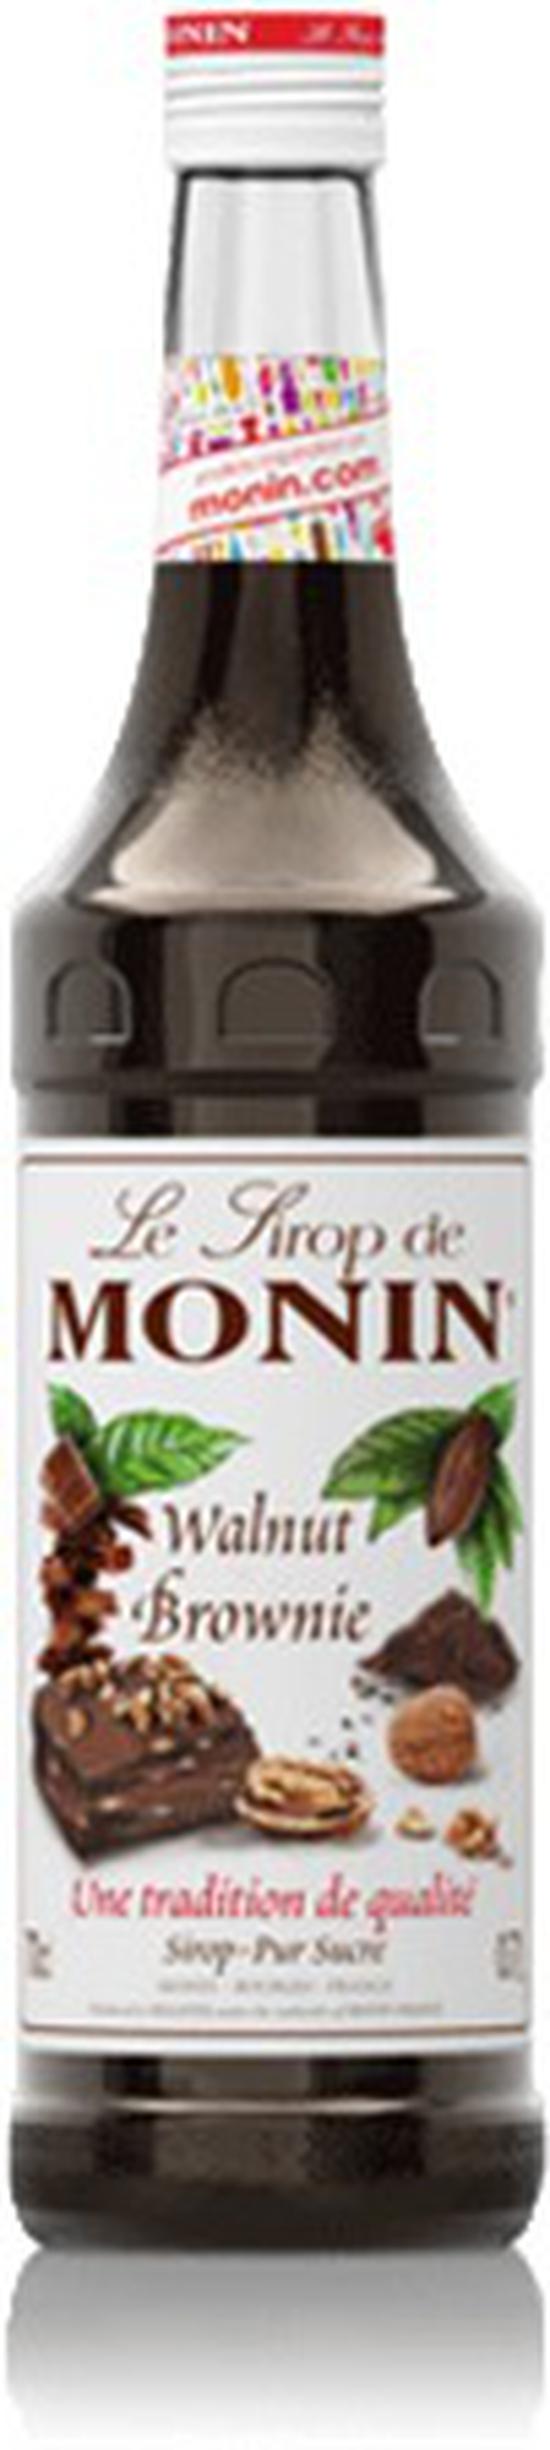 Siro Trà Phúc Bồn Tử (Raspberry Tea) hiệu Monin-chai 700ml